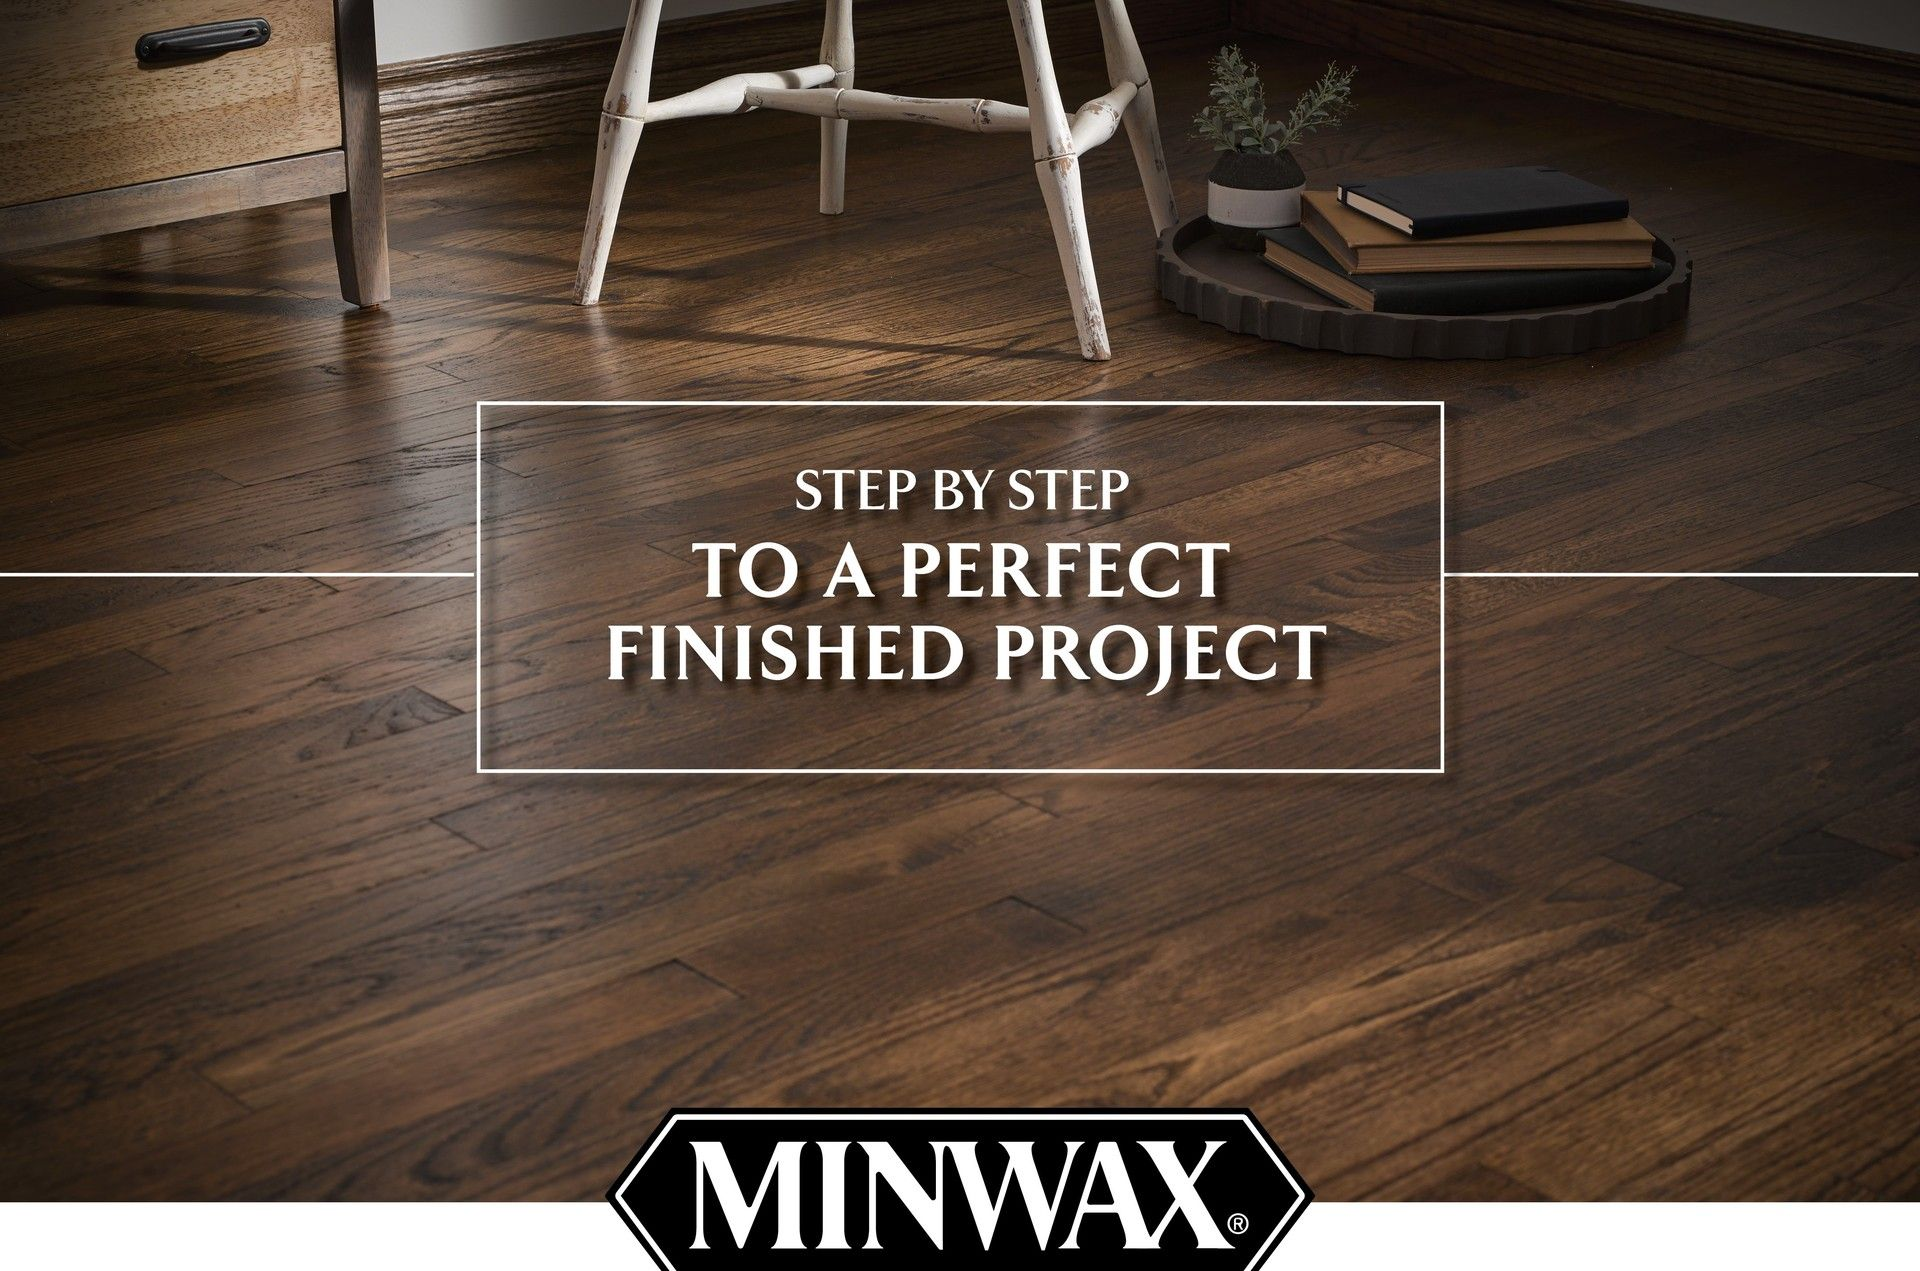 Minwax Wood Finish Satin Dark Walnut Oil Based Interior Stain Actual Net Contents 8 Fl Oz At Lowes Com Minwax Gel Stain Minwax Gel Stain